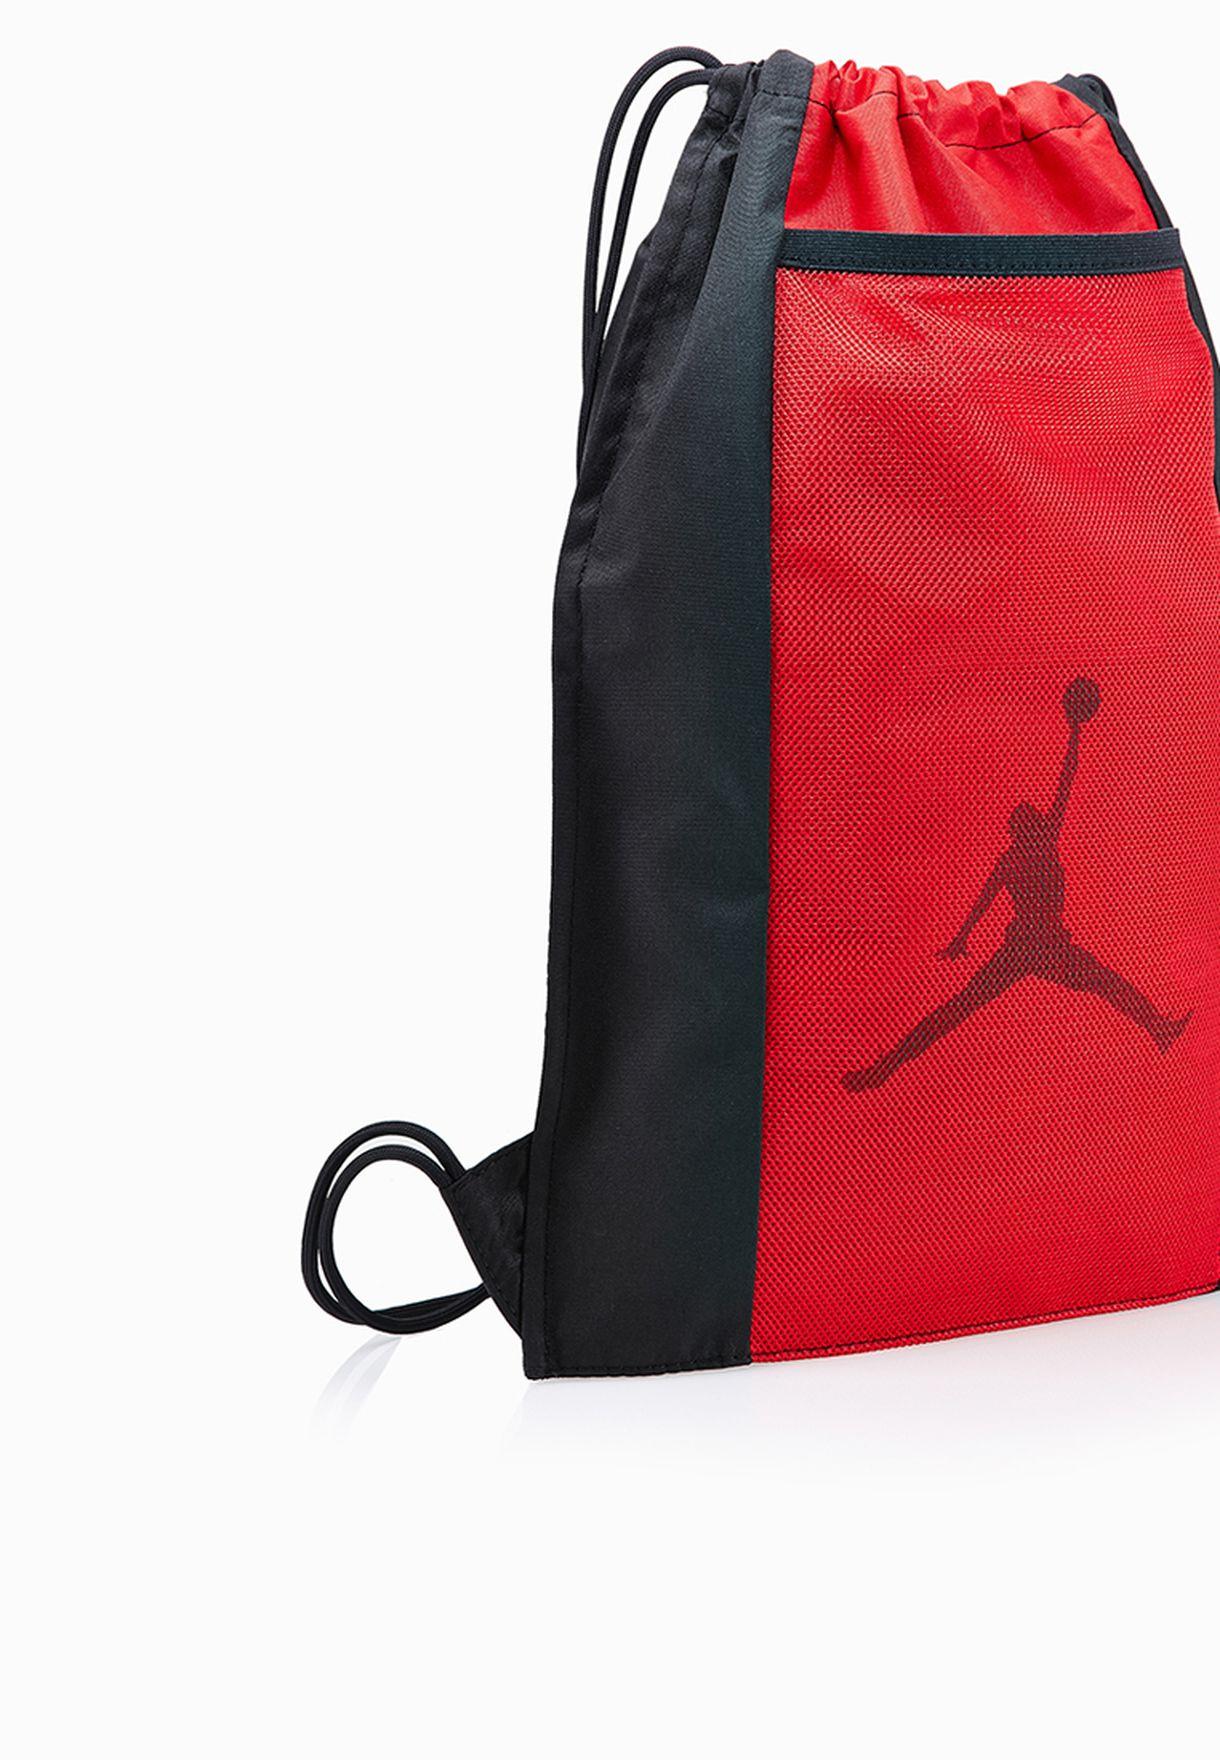 46d28eb0cdb5 Shop Nike red Jordan Dominate Gymsack 612839-012 for Men in ...